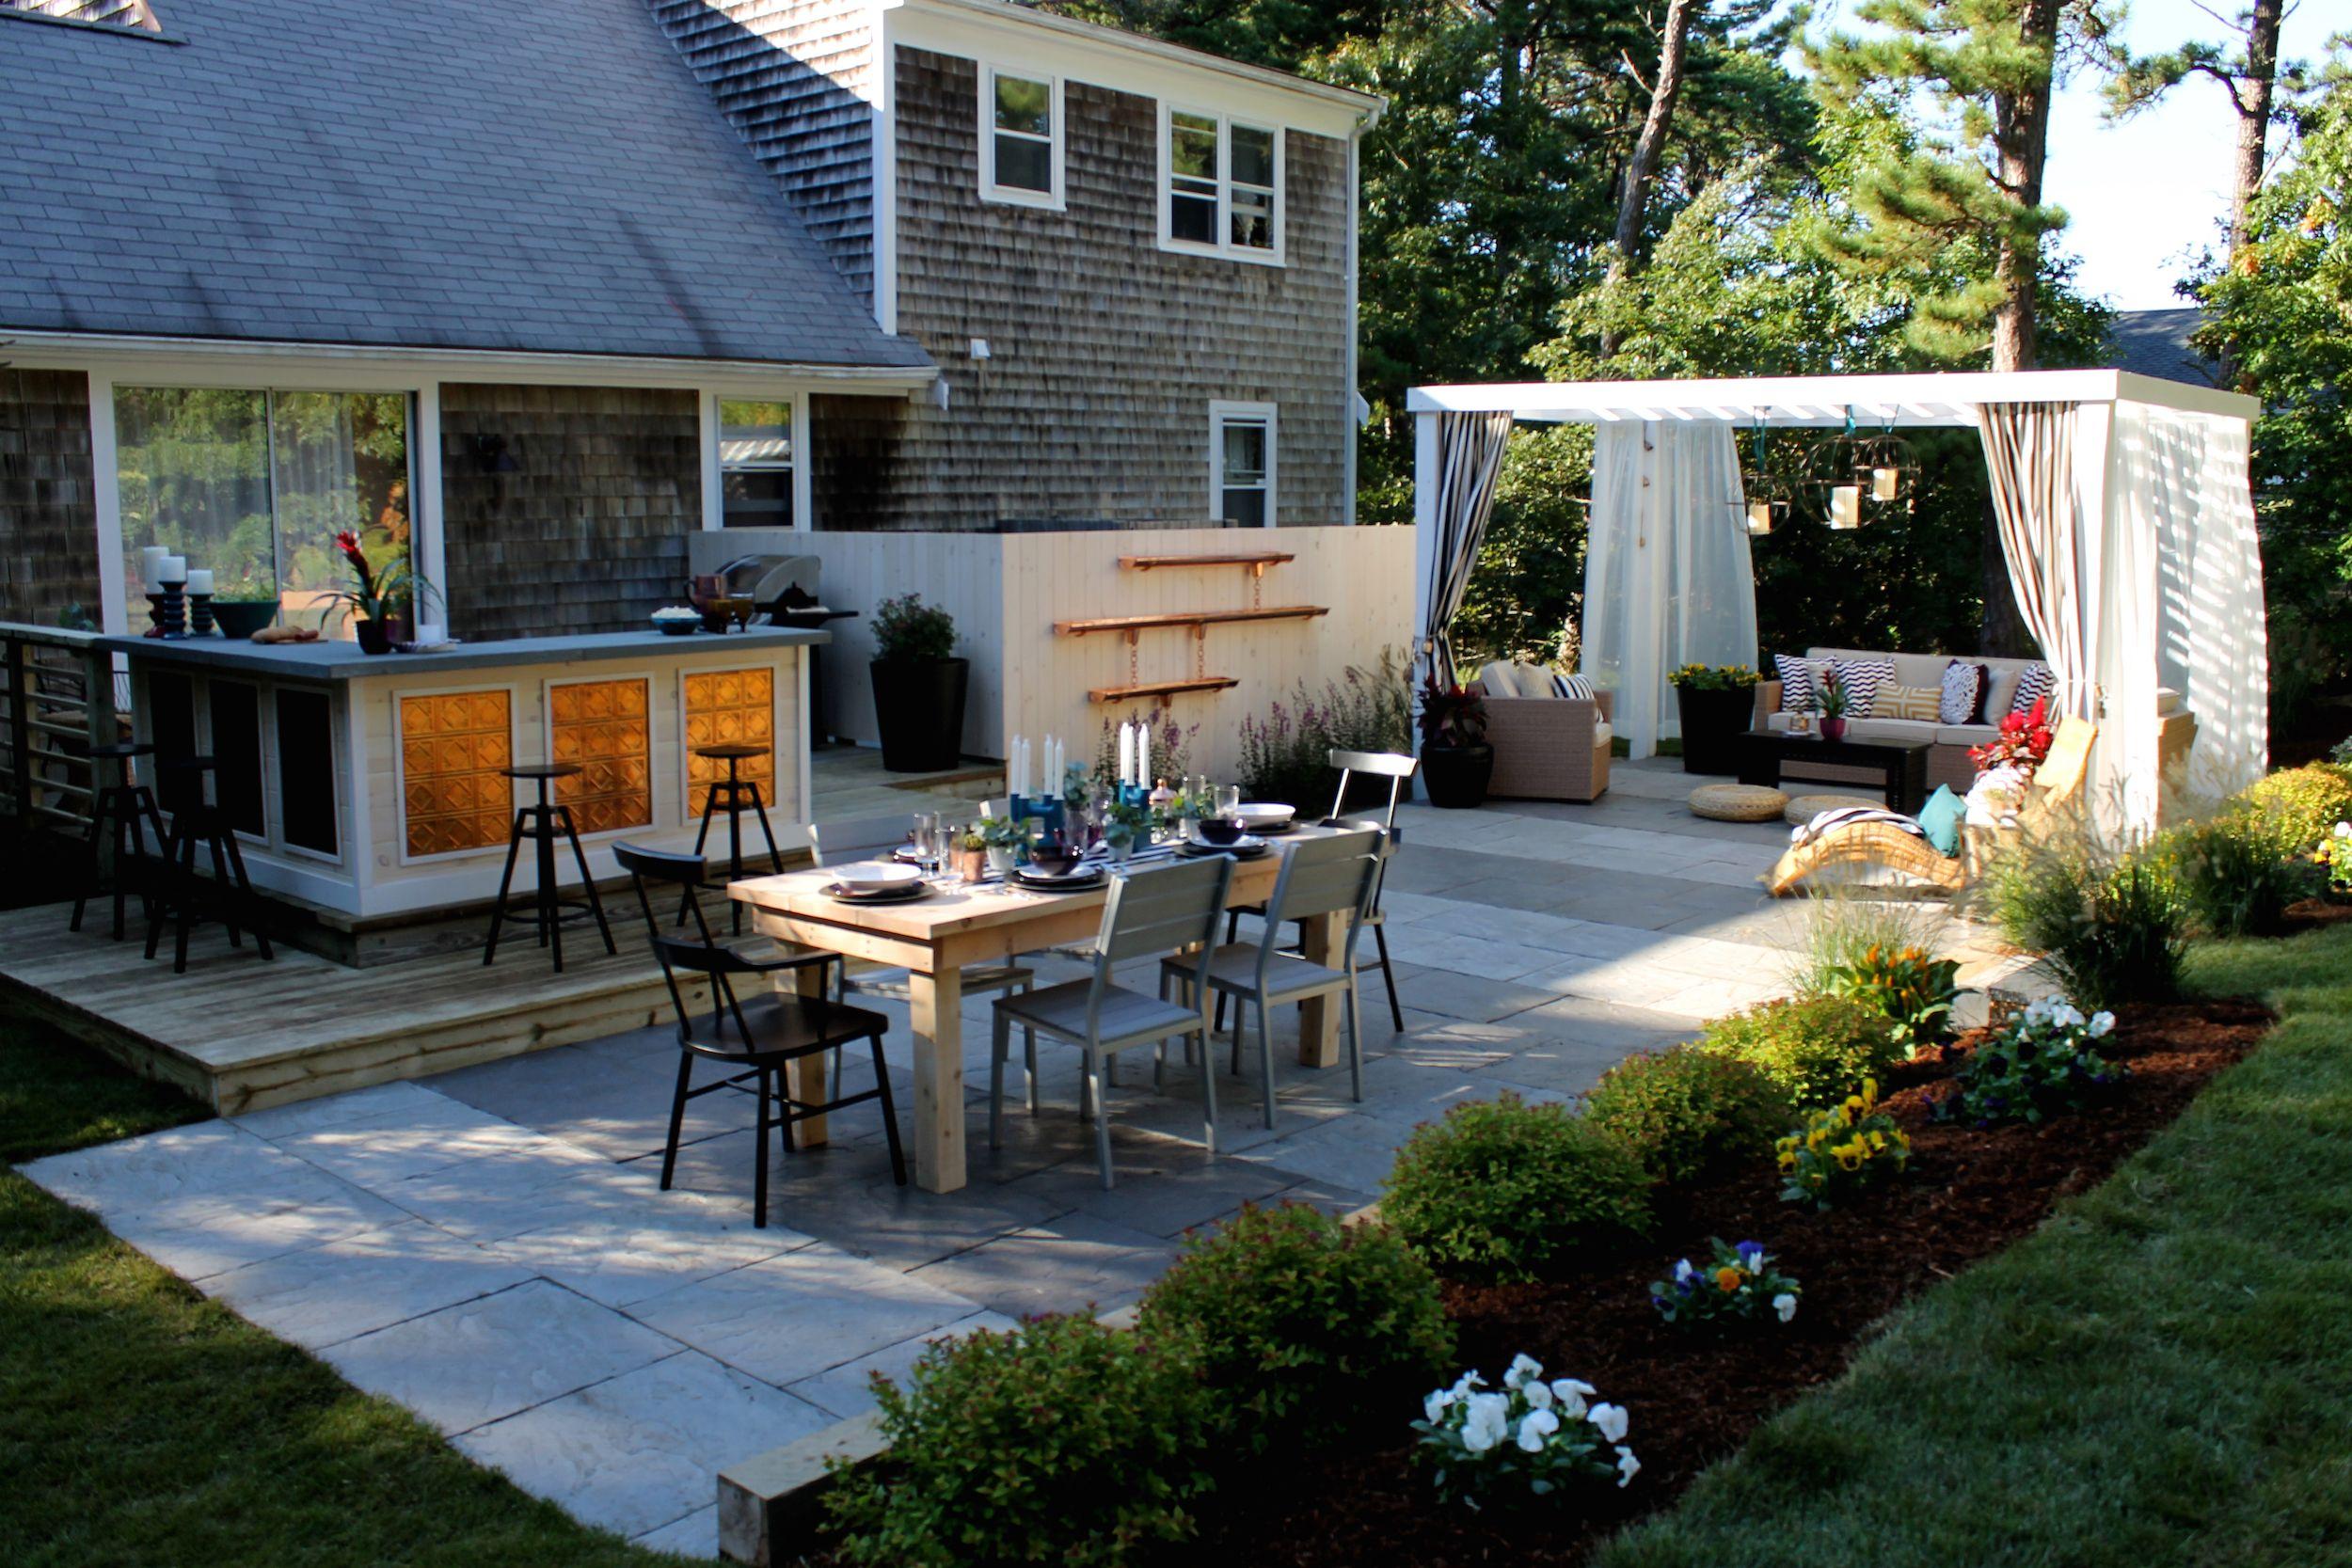 easy landscaping ideas low maintenance landscape design tipslandscaping ideas for a low maintenance yard